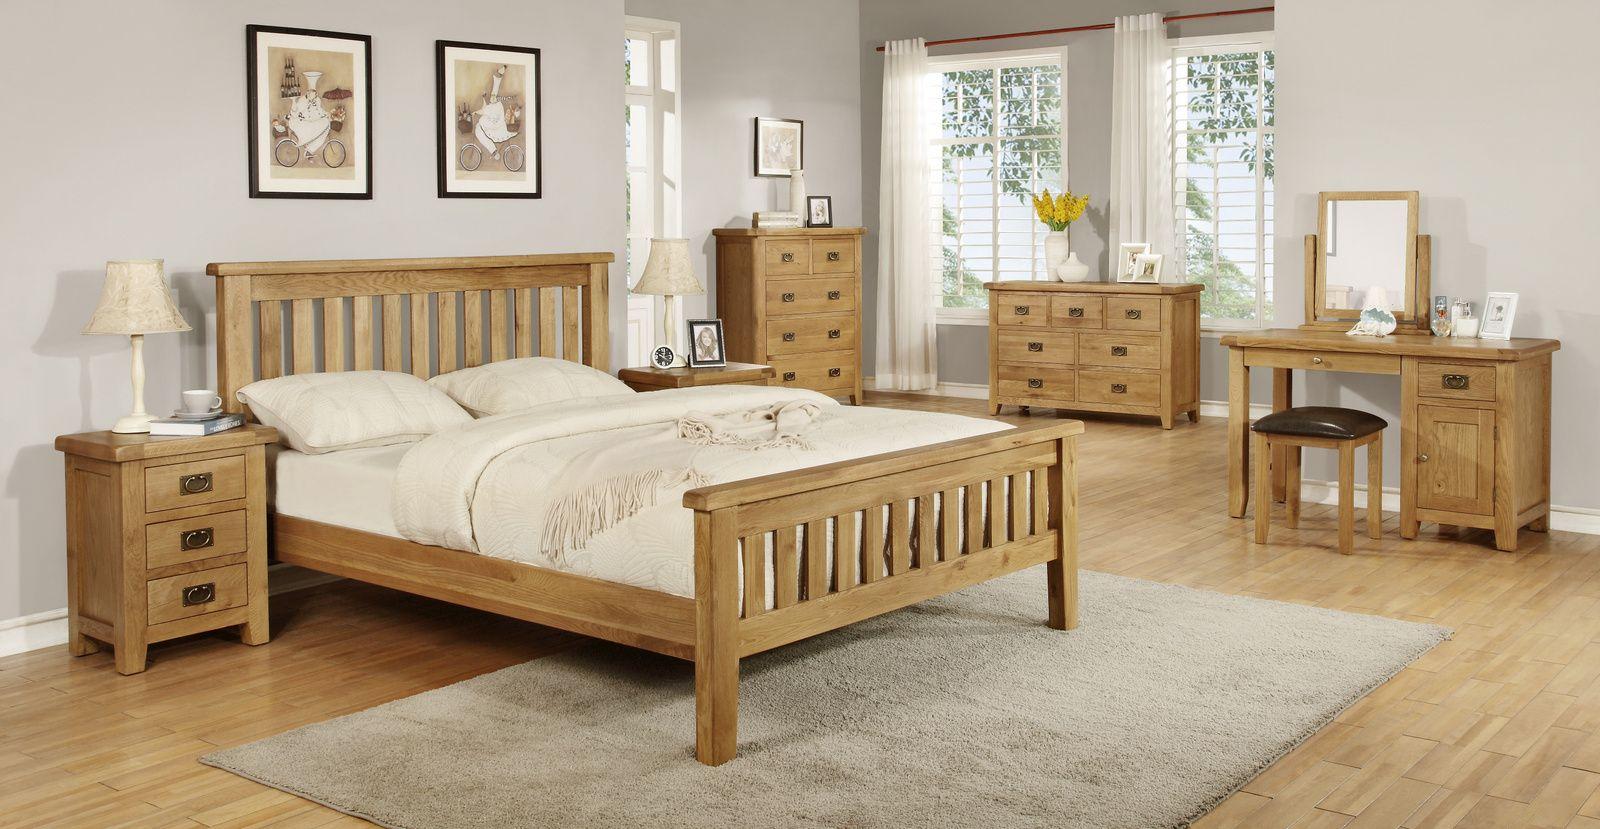 broyhill farnsworth bedroom furniture Oak bedroom furniture